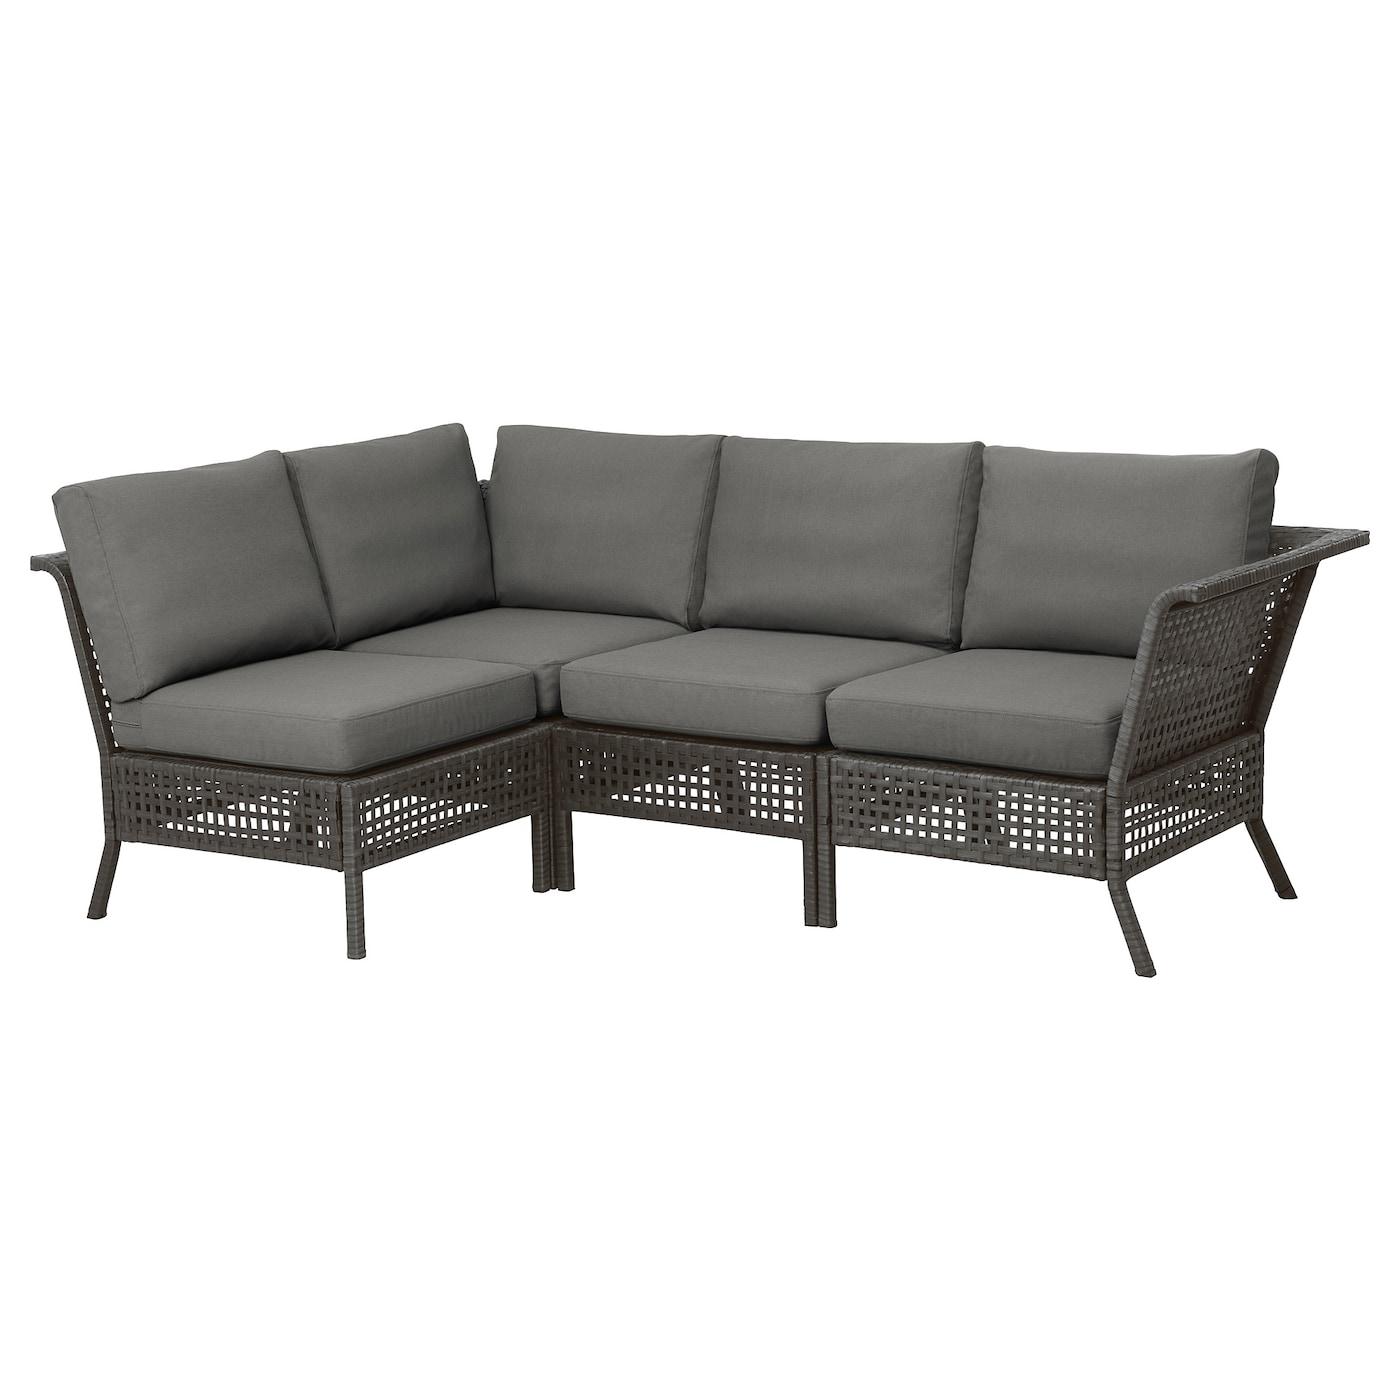 KUNGSHOLMEN Modular corner sofa 3-seat, outdoor, black-brown,  Frösön/Duvholmen dark gray